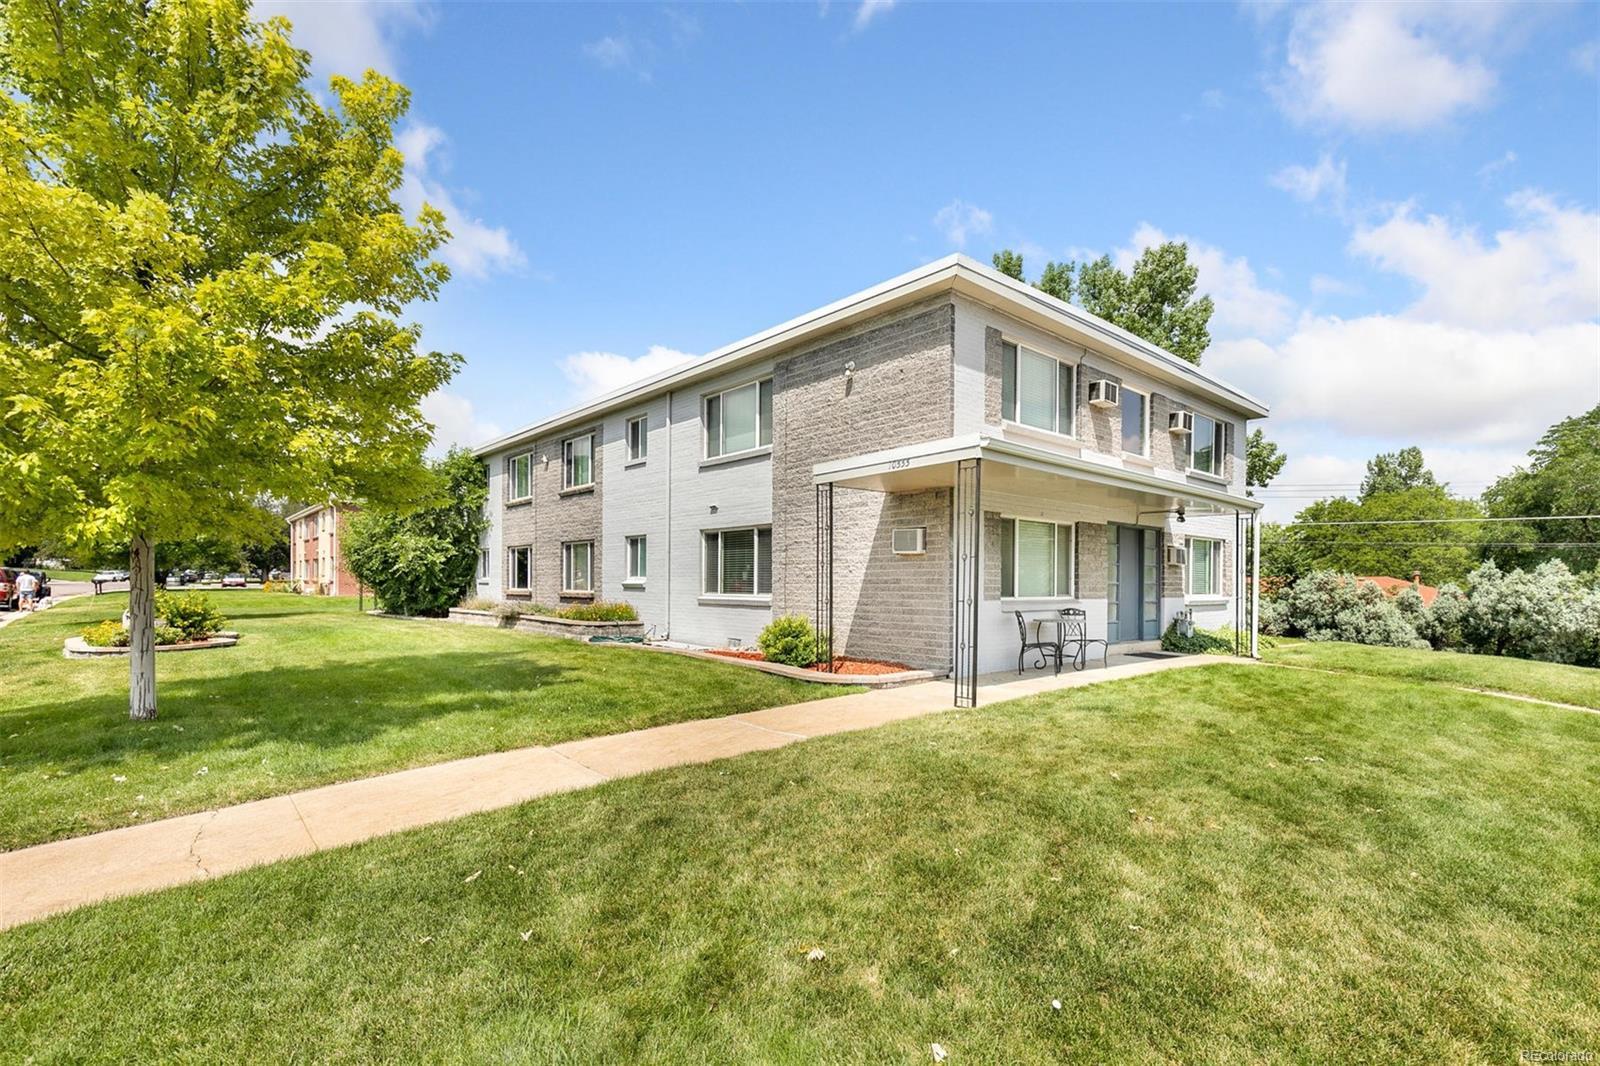 10555 W 8th Avenue, Lakewood, CO 80215 - Lakewood, CO real estate listing